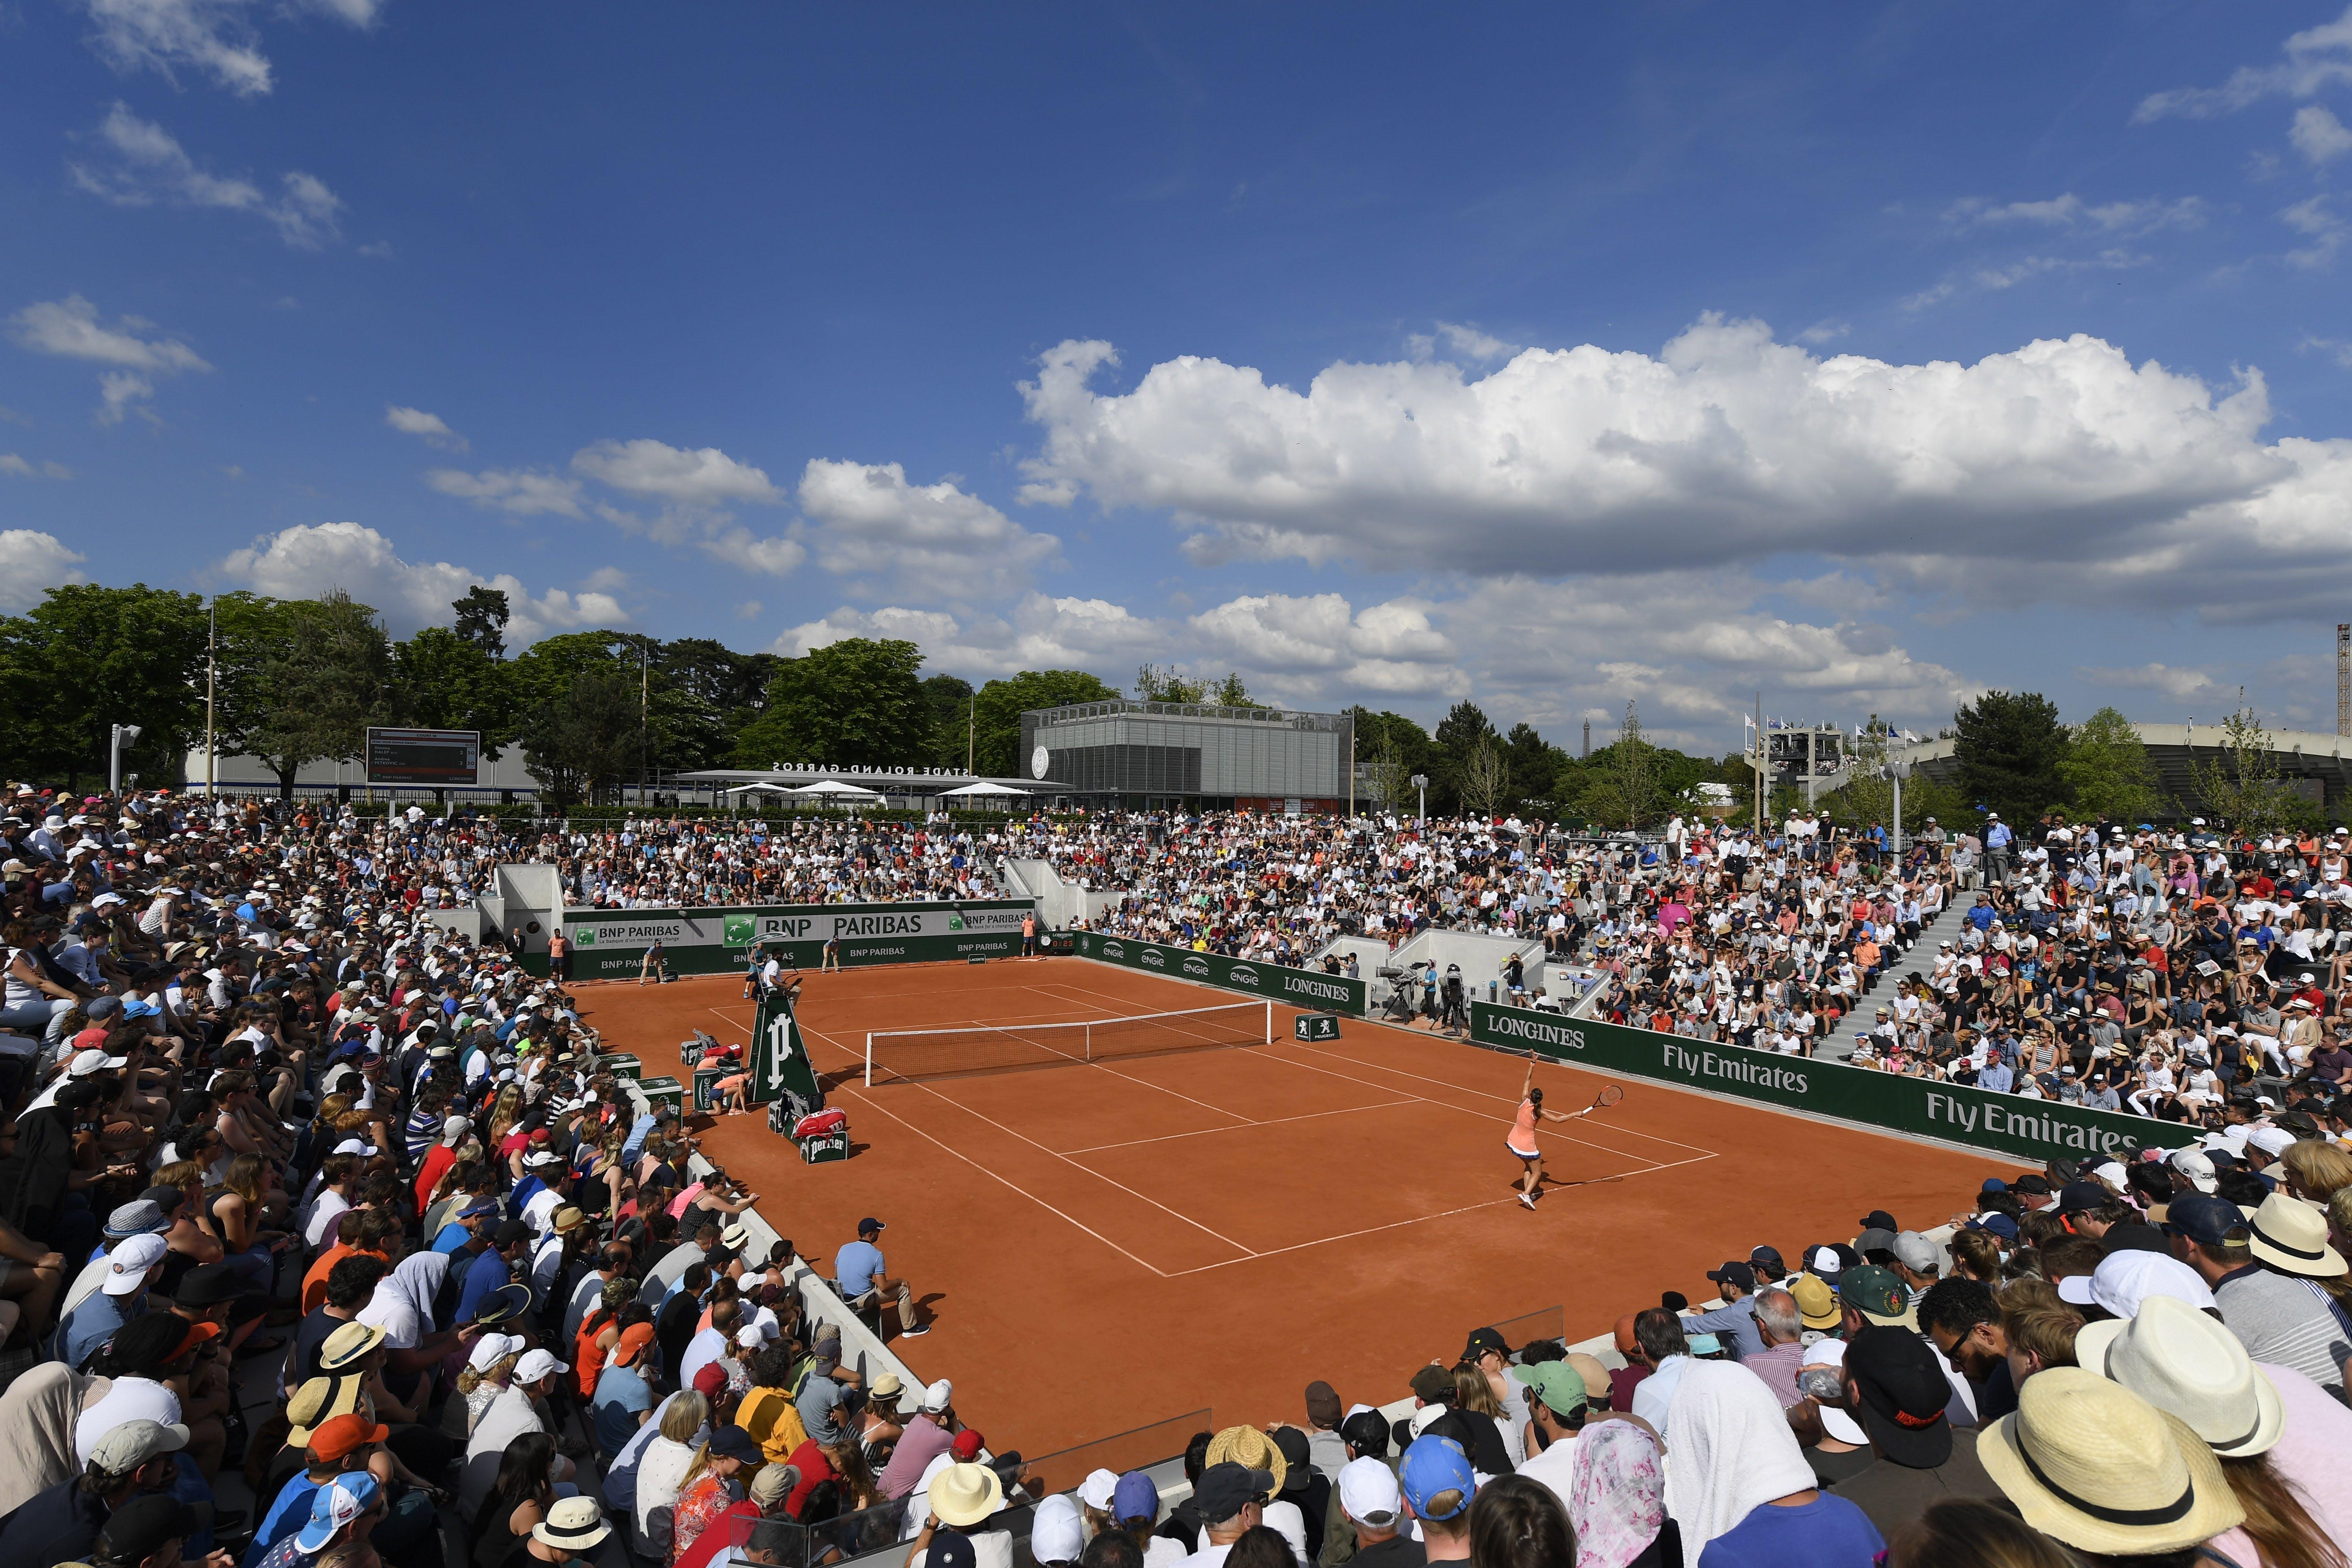 Qualifications Roland-Garros 2018 Court 18